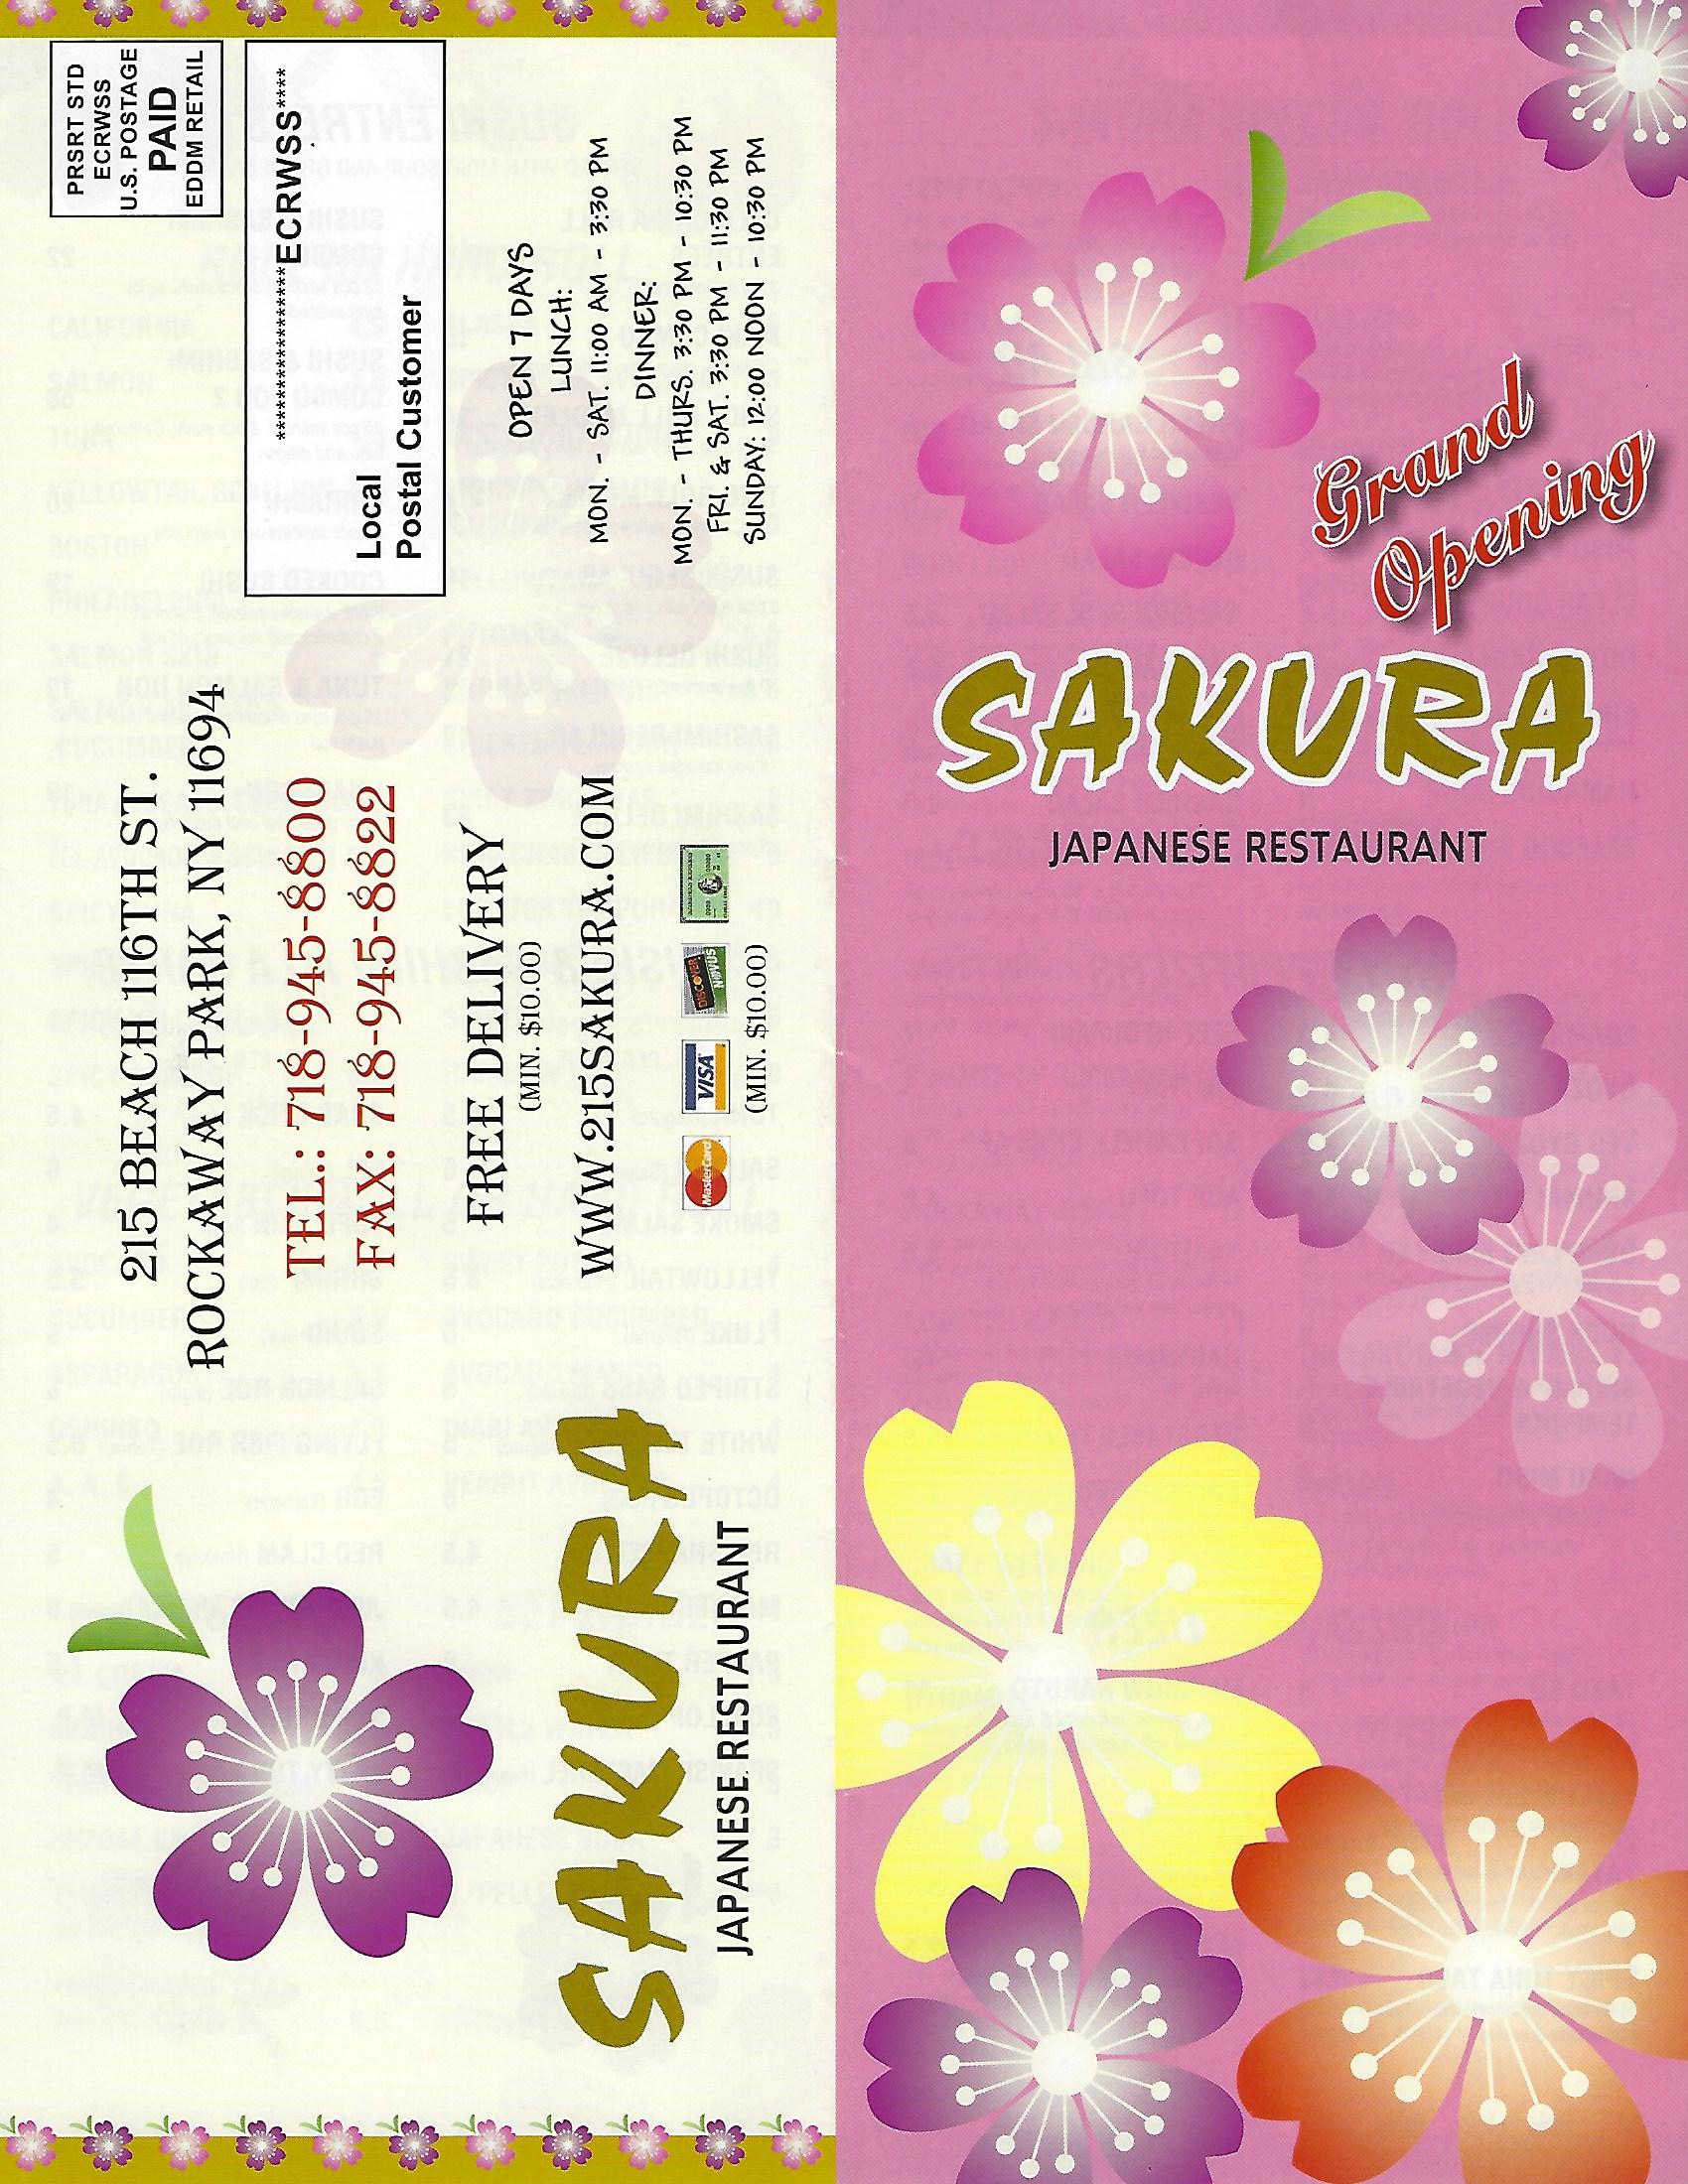 The Castle Rockaway_Sakura